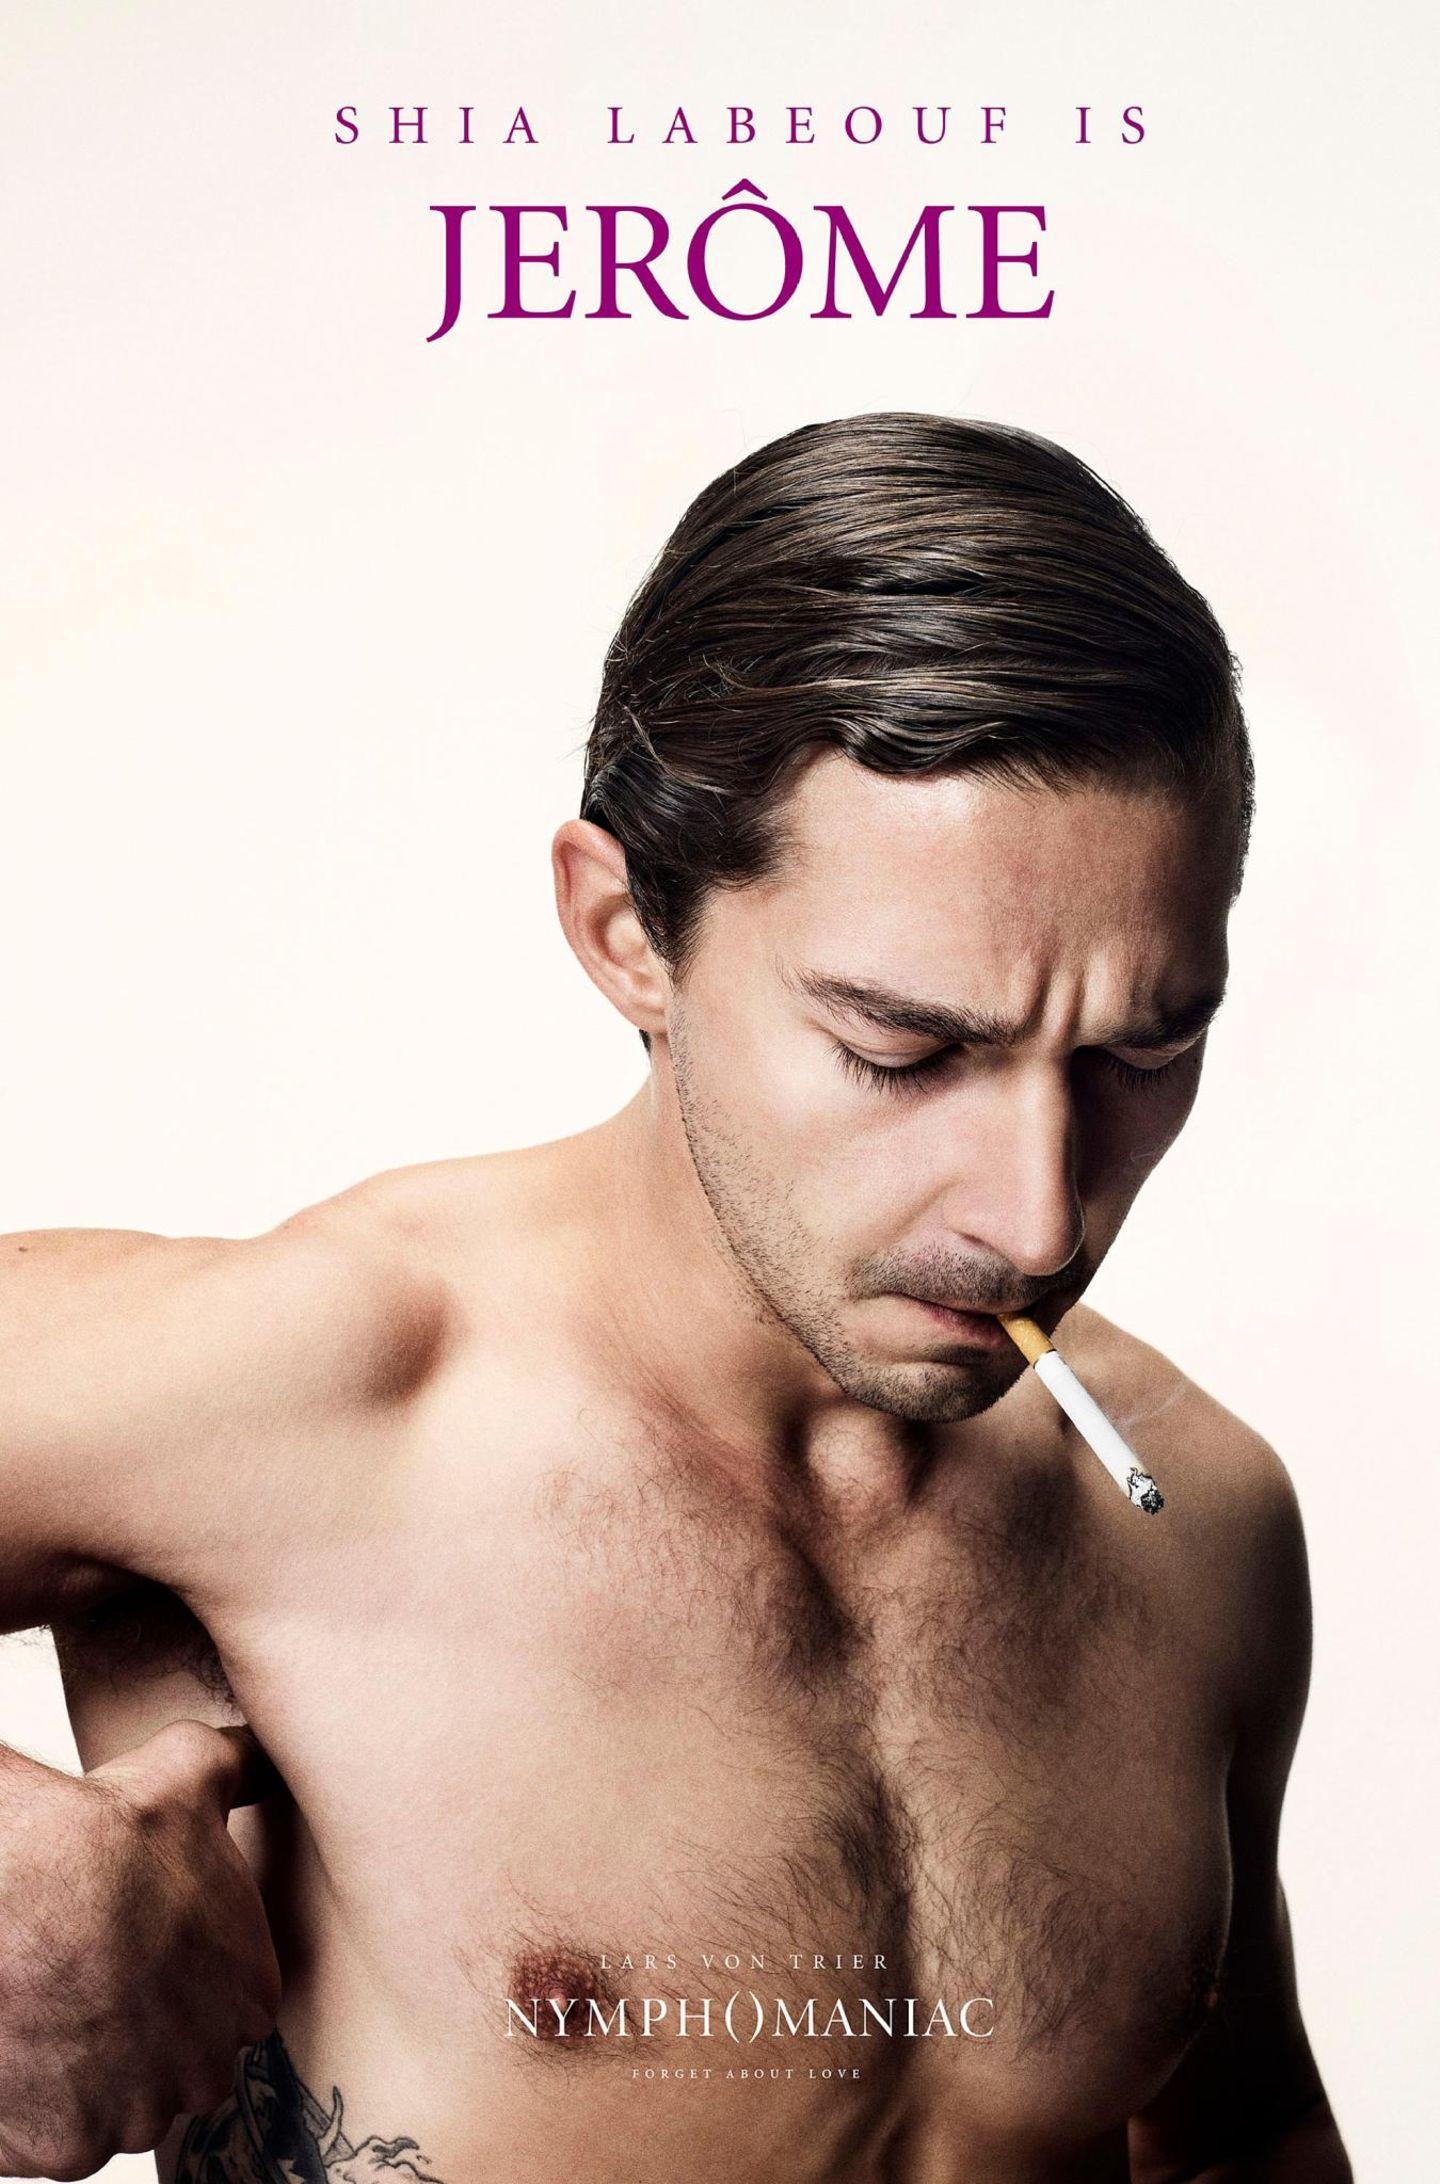 "Mit Zigarette danach: Shia LaBeouf tritt in ""Nymphomaniac"" als Womanizer auf."